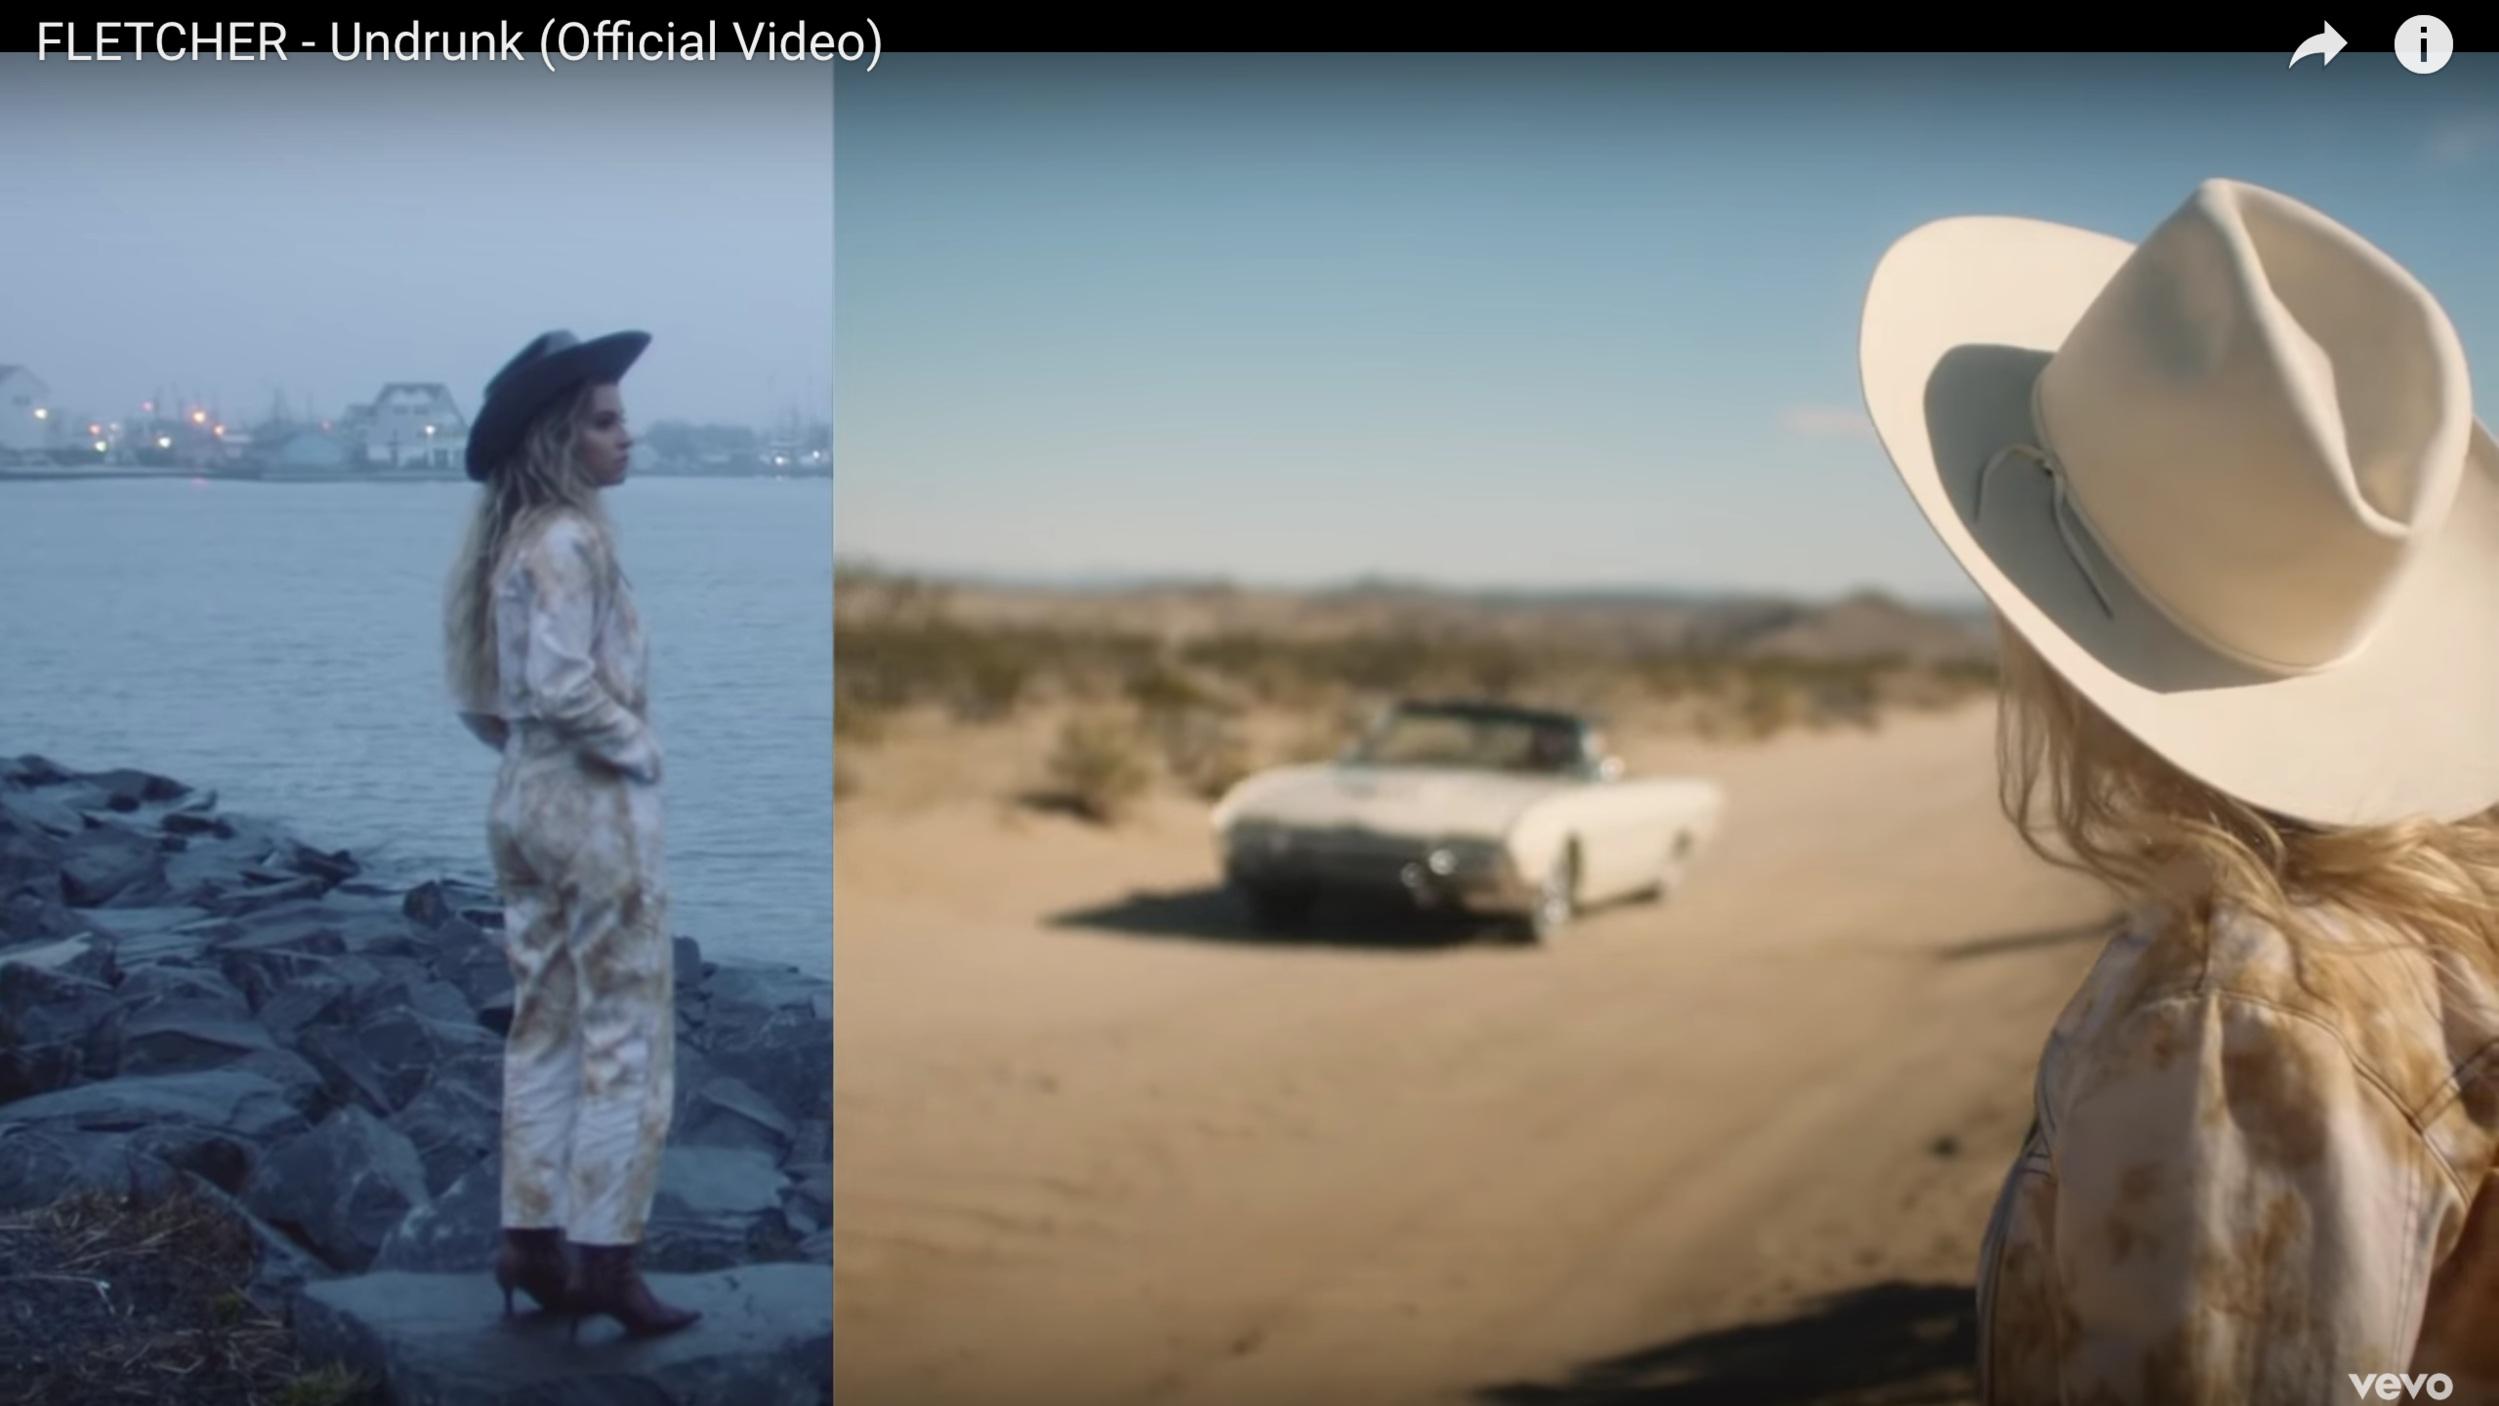 Music video: Fletcher - Undrunk - Check out Joe's 1962 Thunderbird in this Pop Music Video shot in the Joshua Tree desert.